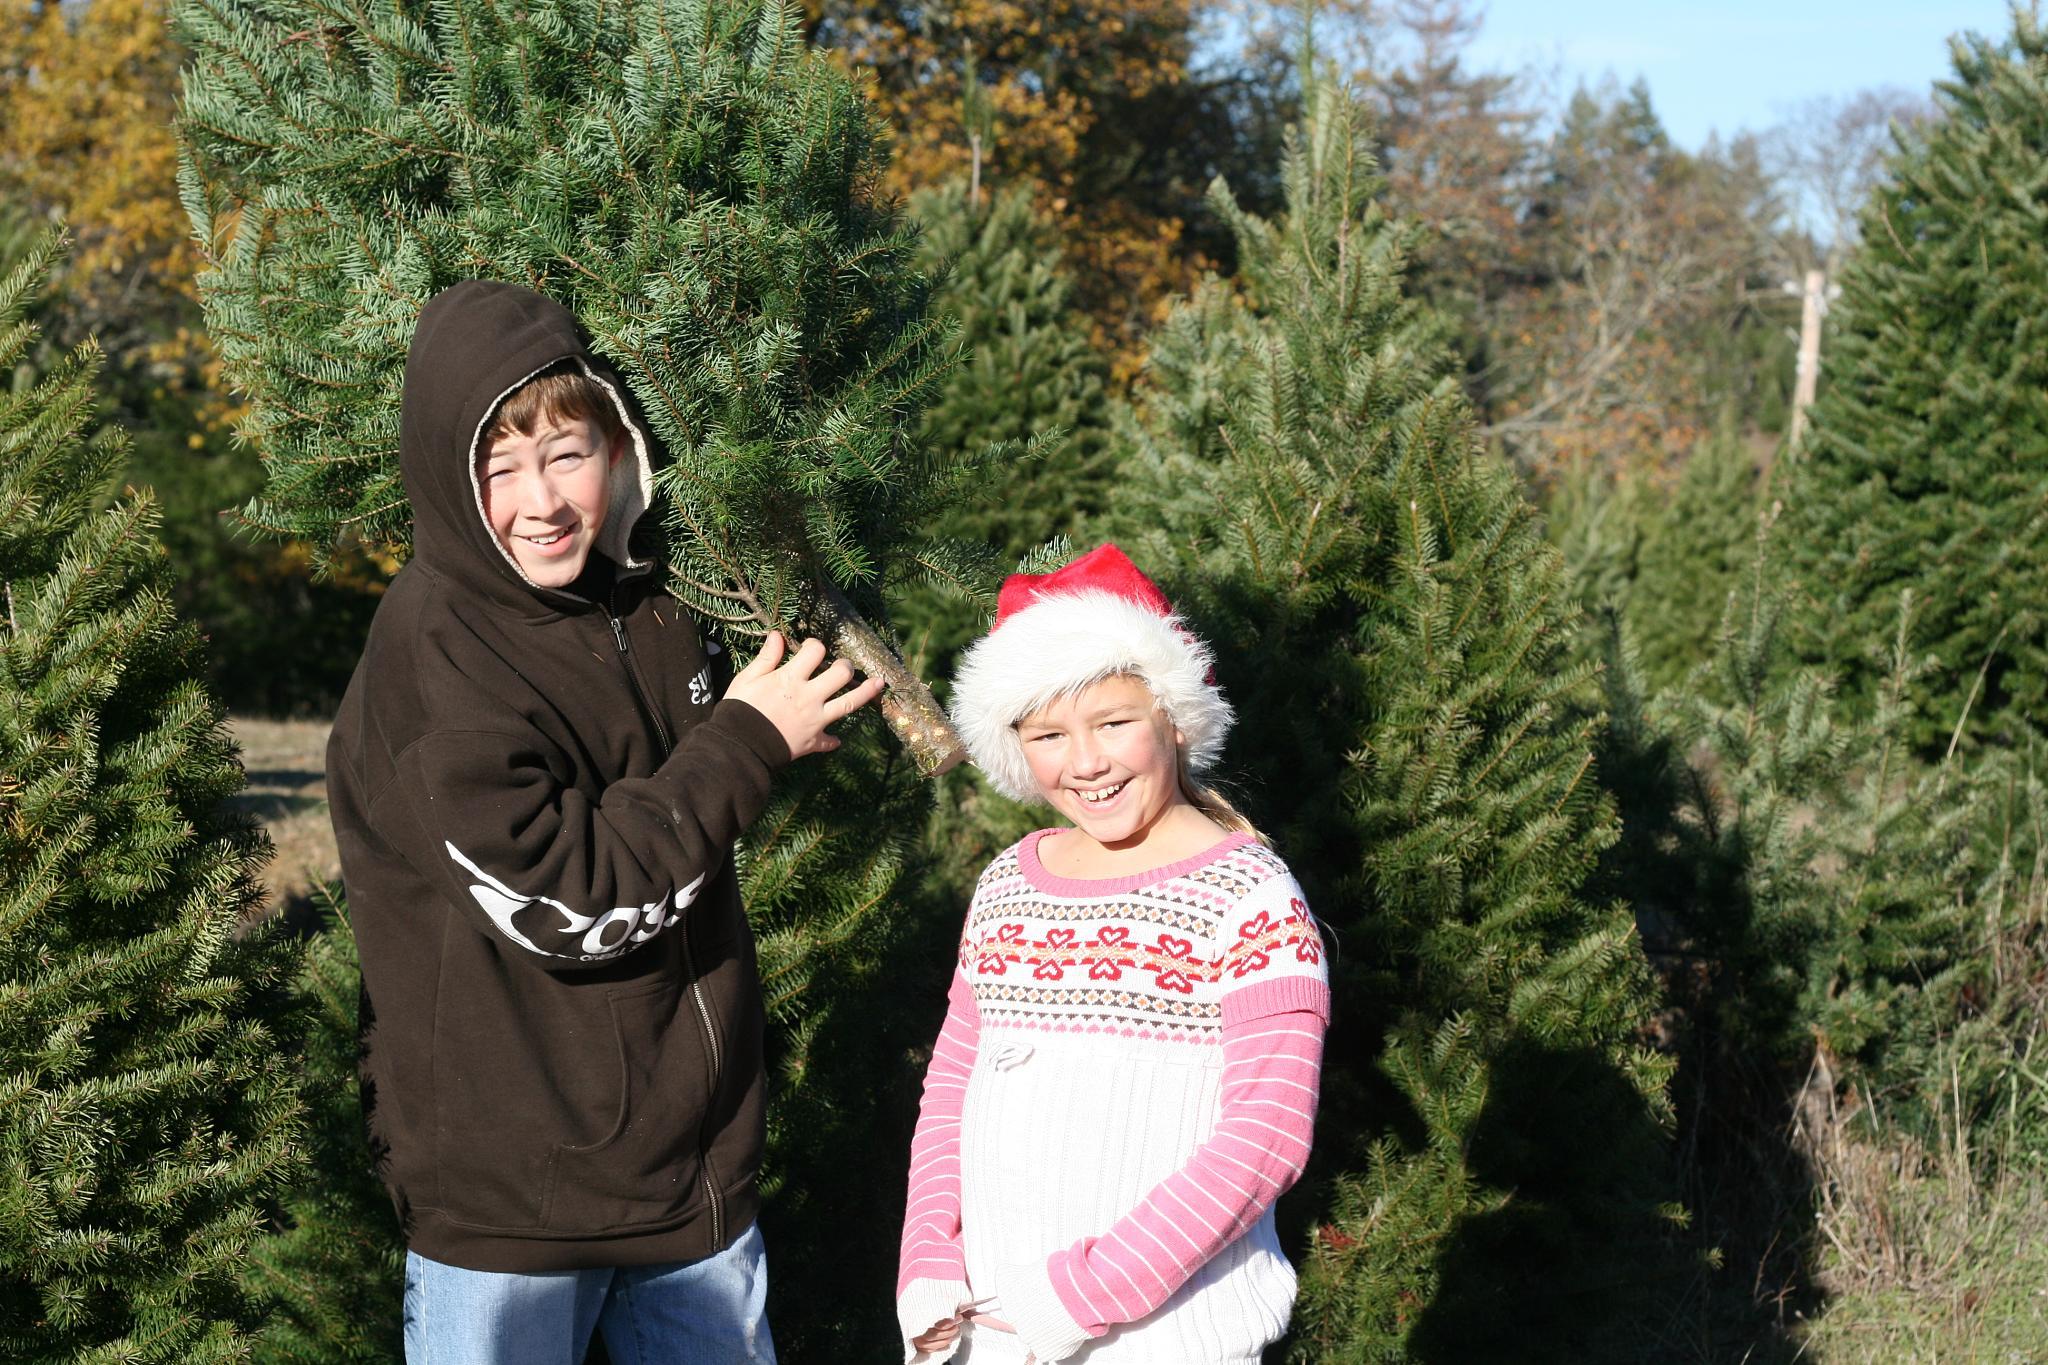 7 Best Christmas Tree Farms Near Dallas, Texas